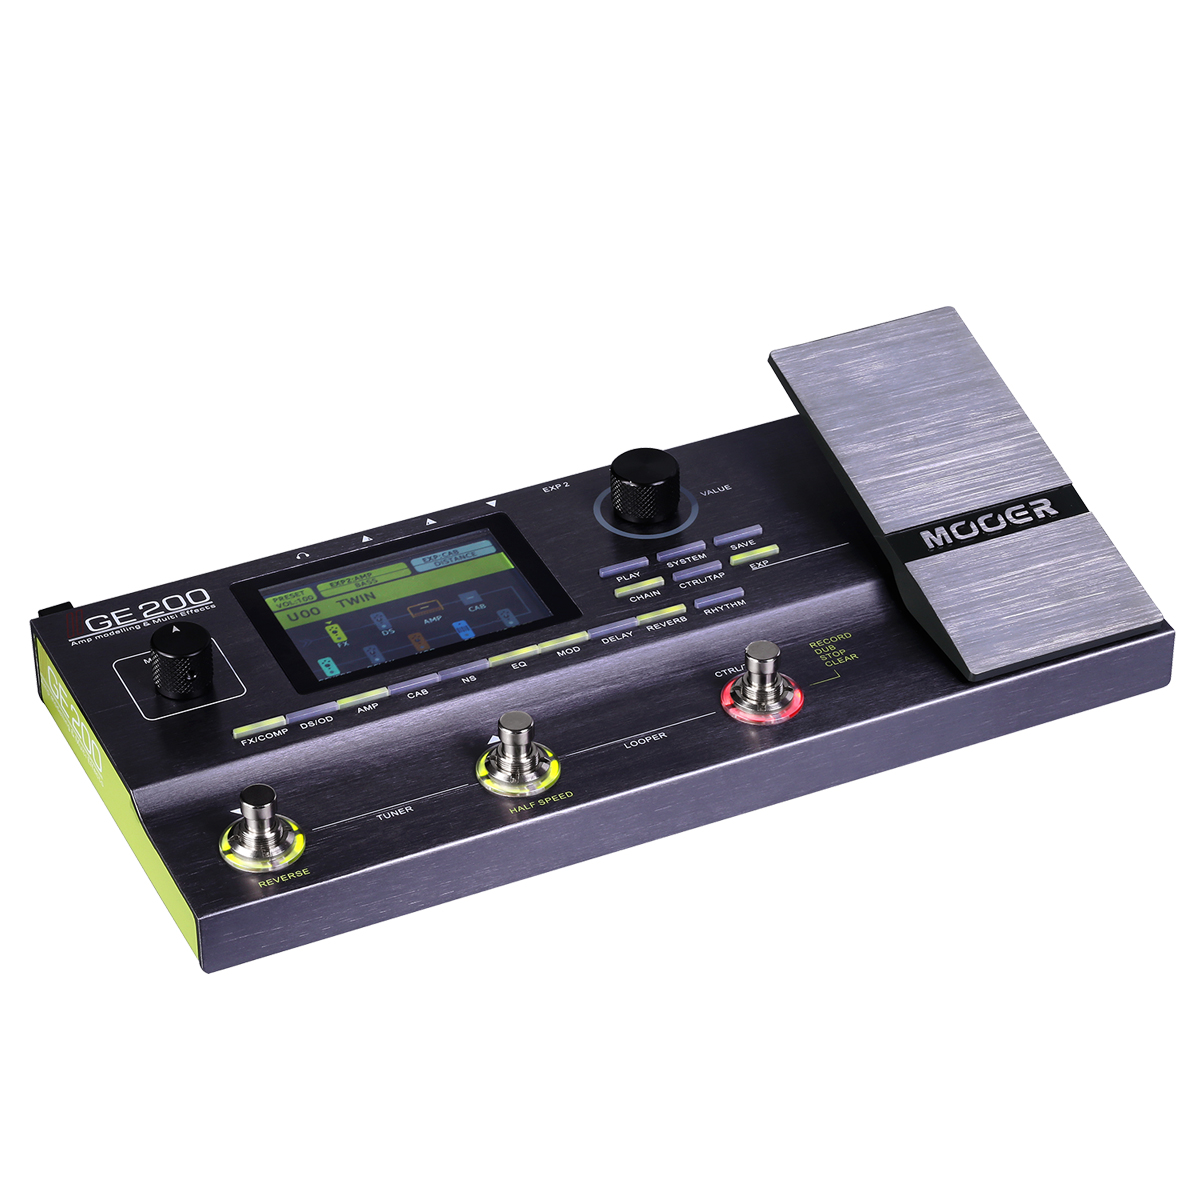 Mooer GE200 Preventa + Accesory Kit de Regalo